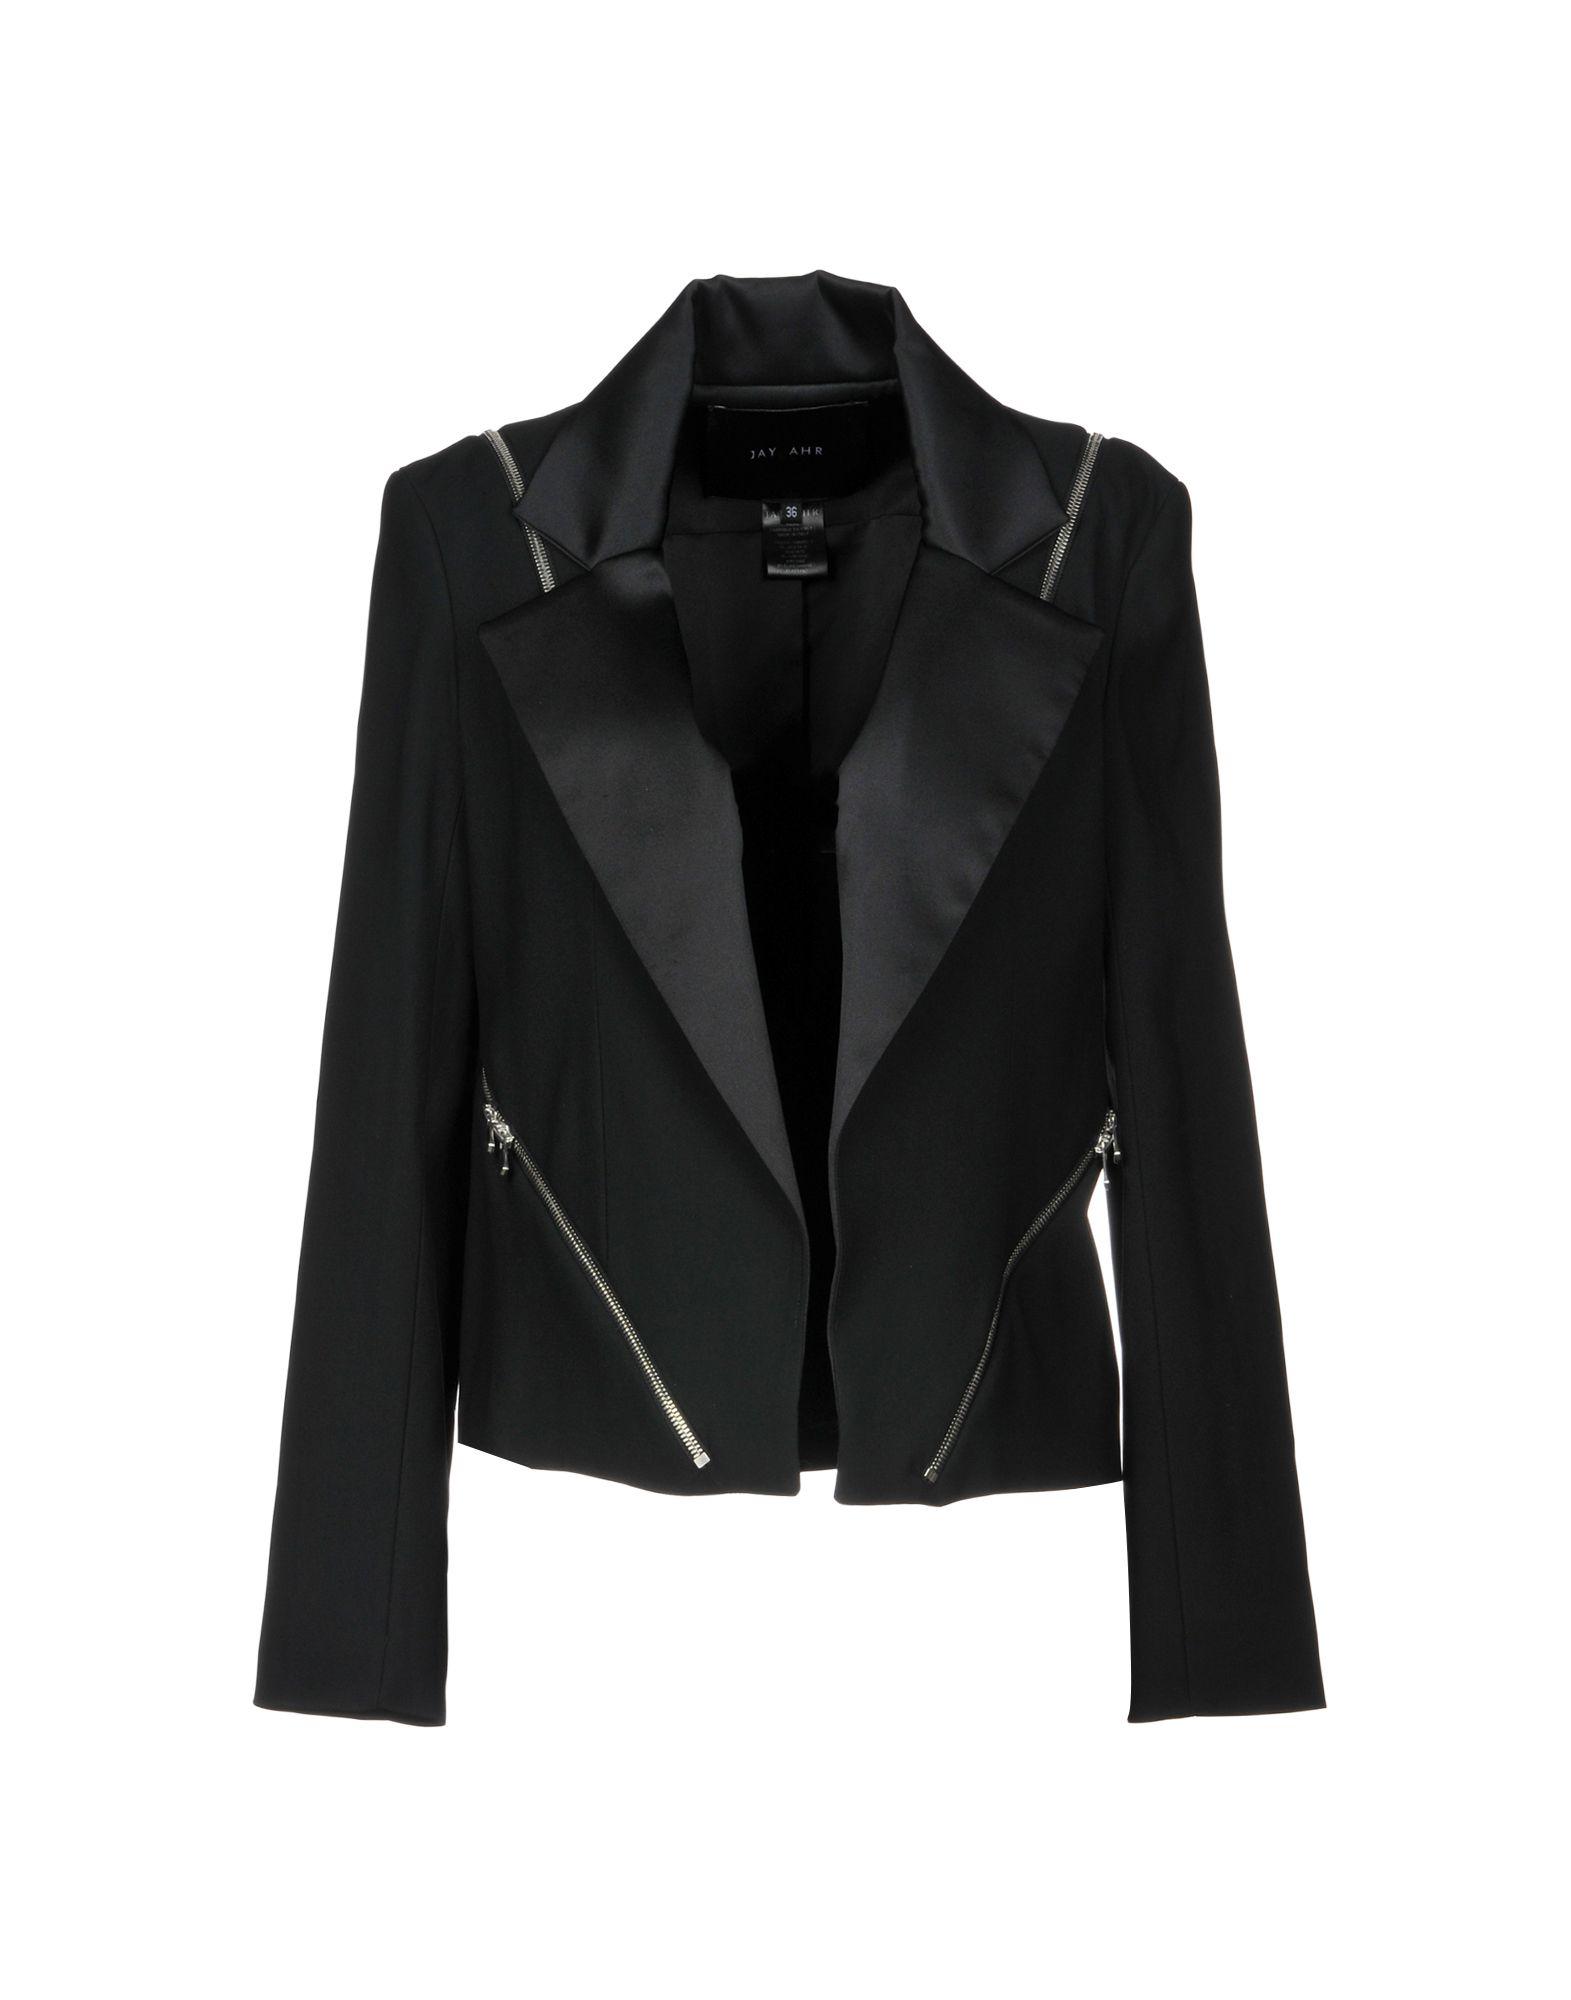 JAY AHR Blazer in Black